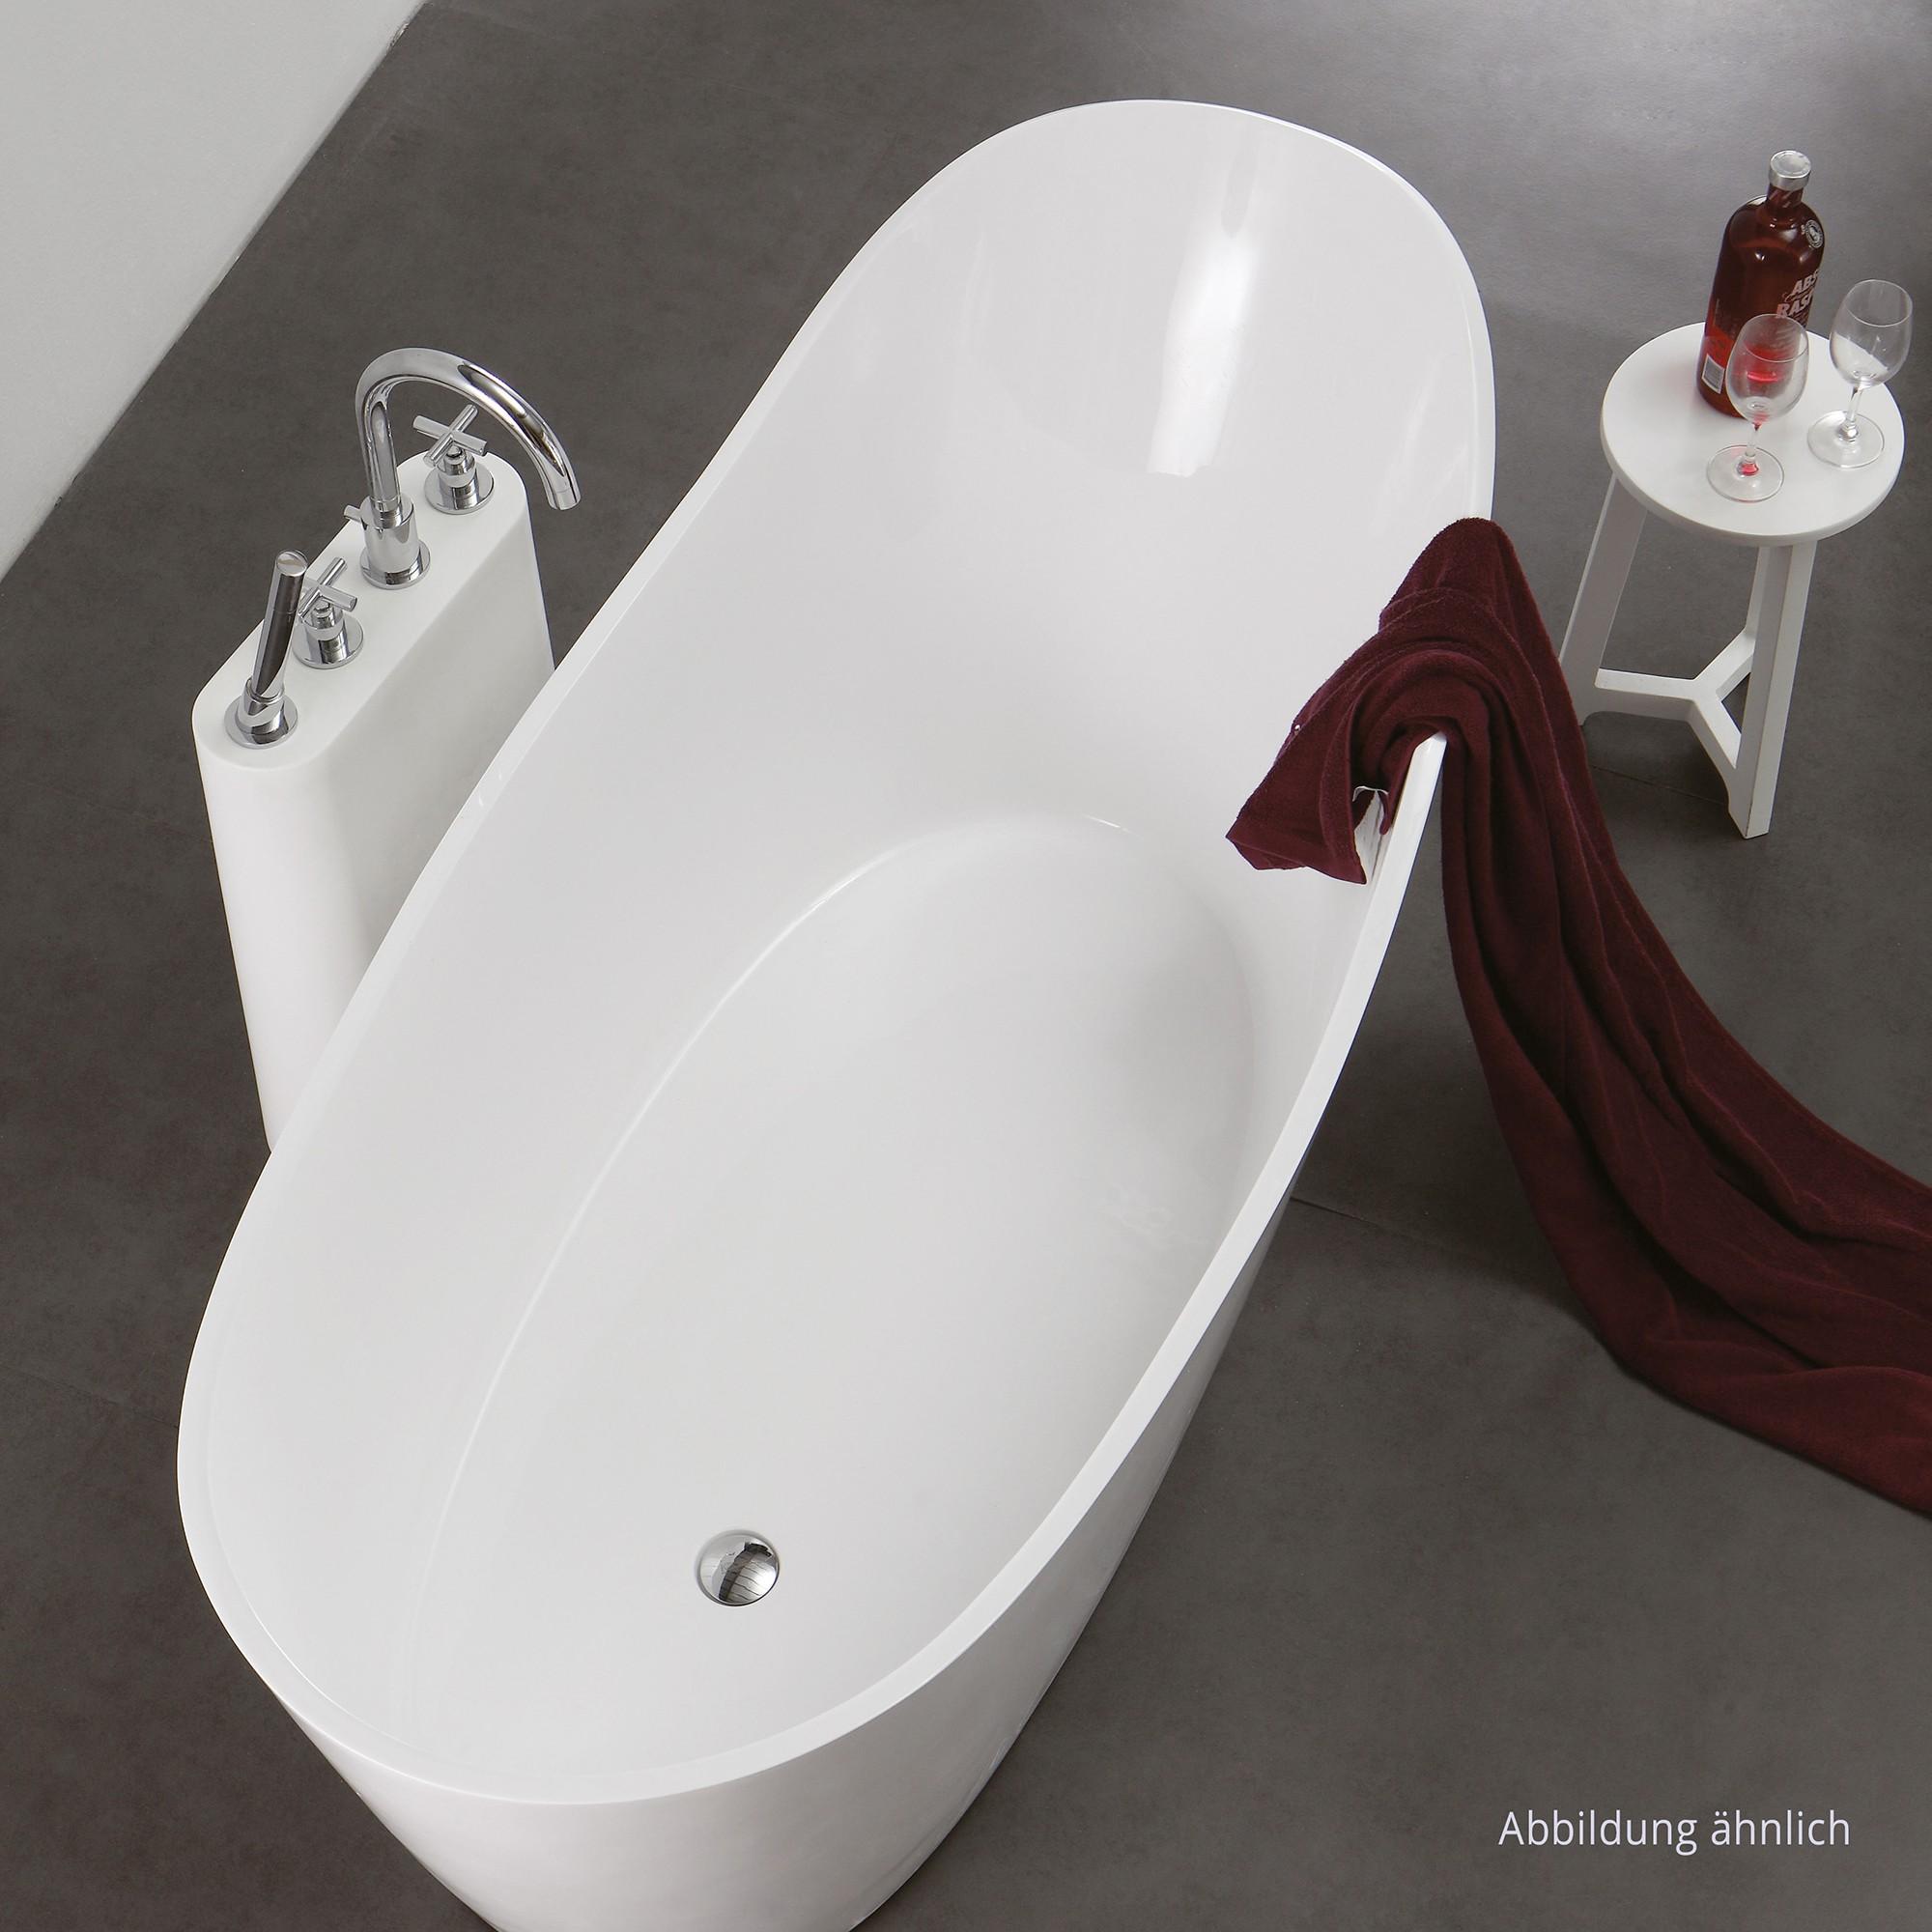 kzoao armaturens ule 0908 f r freistehende badewanne. Black Bedroom Furniture Sets. Home Design Ideas